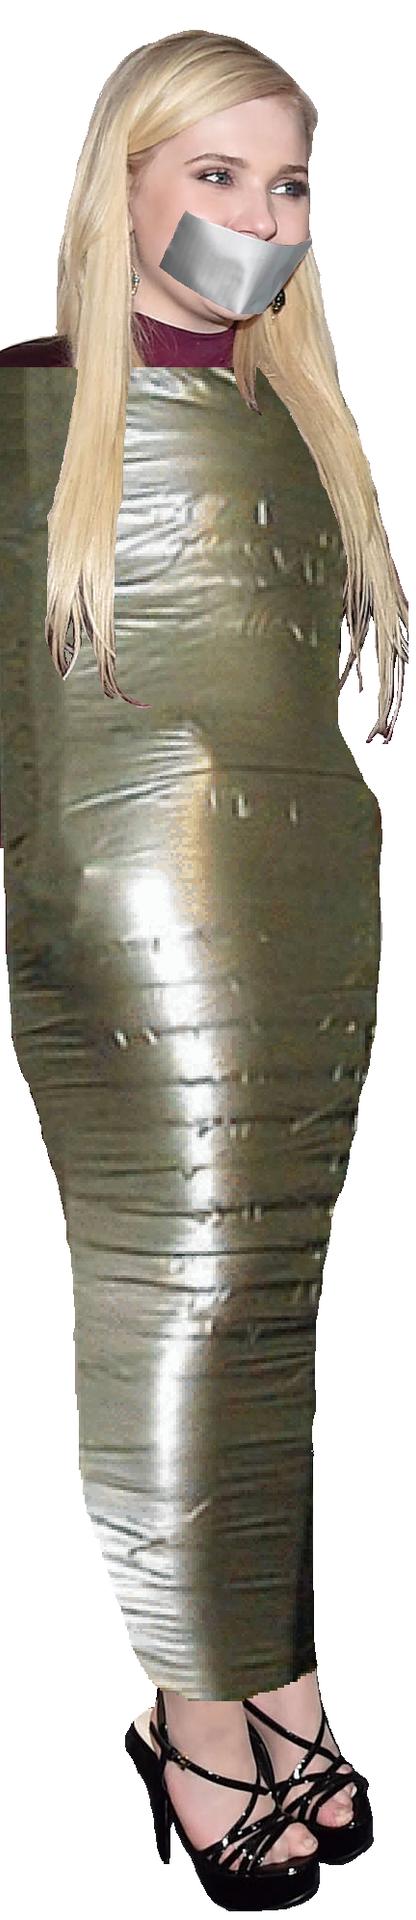 abigail breslin sextape